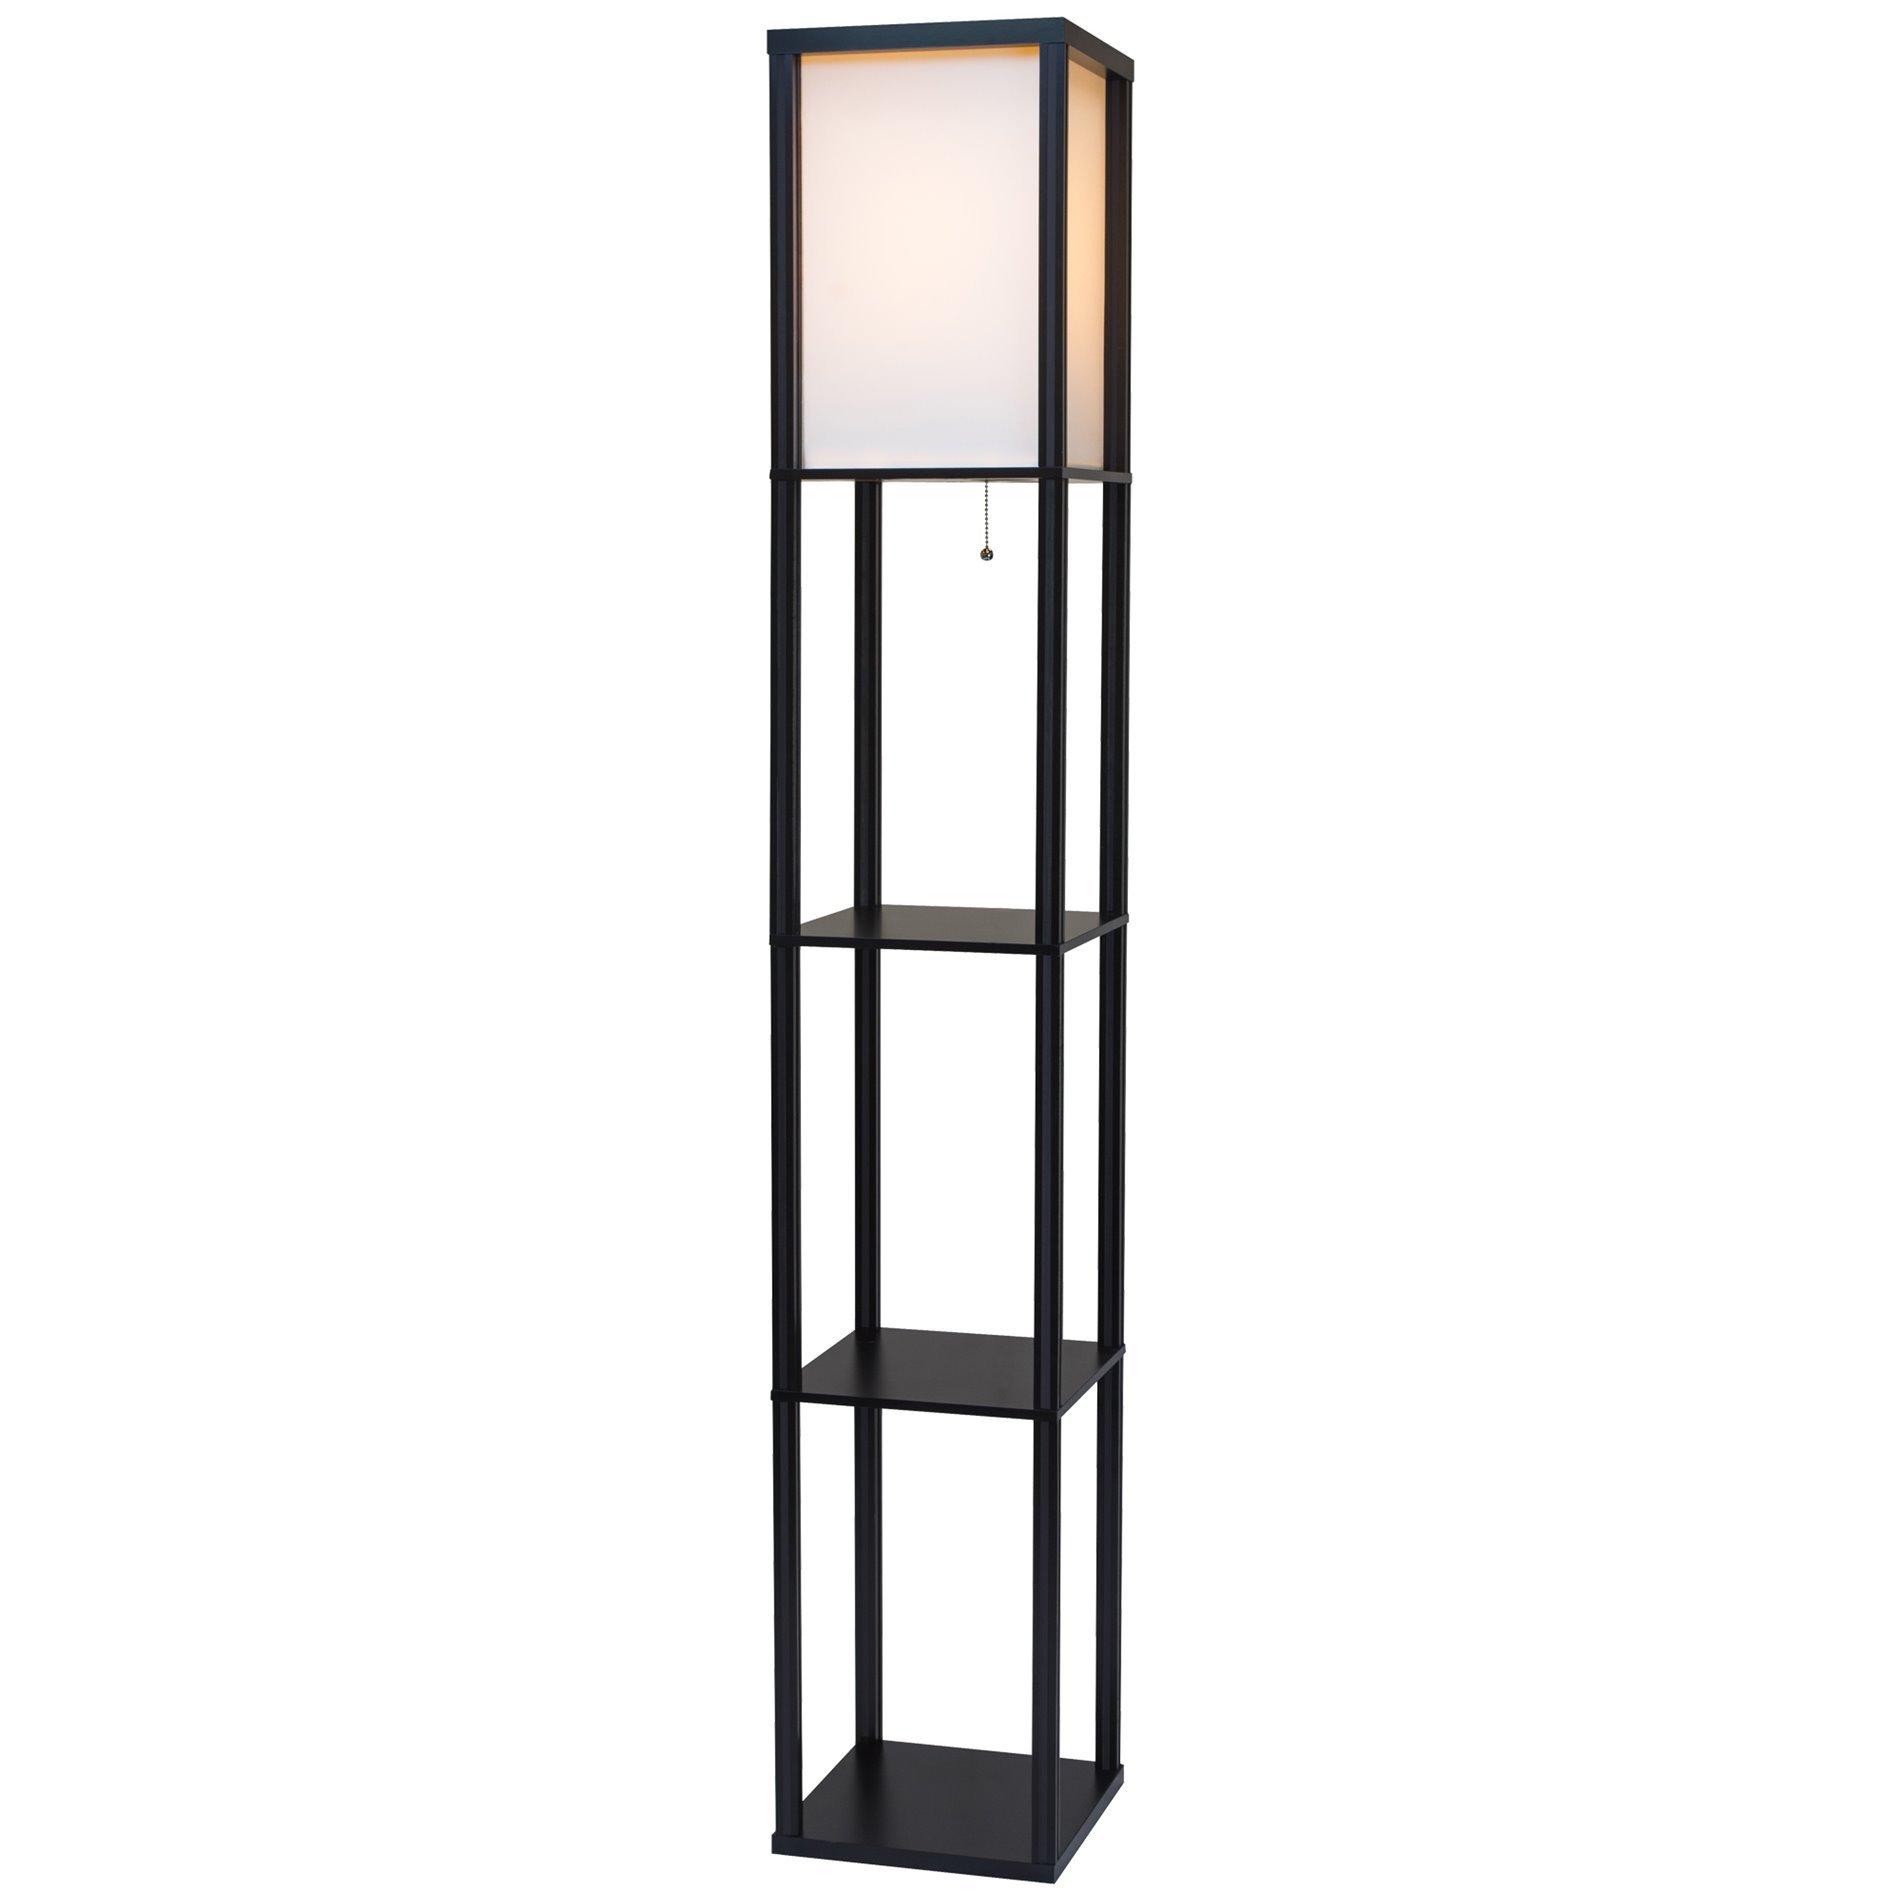 Revel Toro 62.5'' Wood Floor Lamp with Shelves & Off White Shade + 100W Energy Efficient Bulb by Kira Home